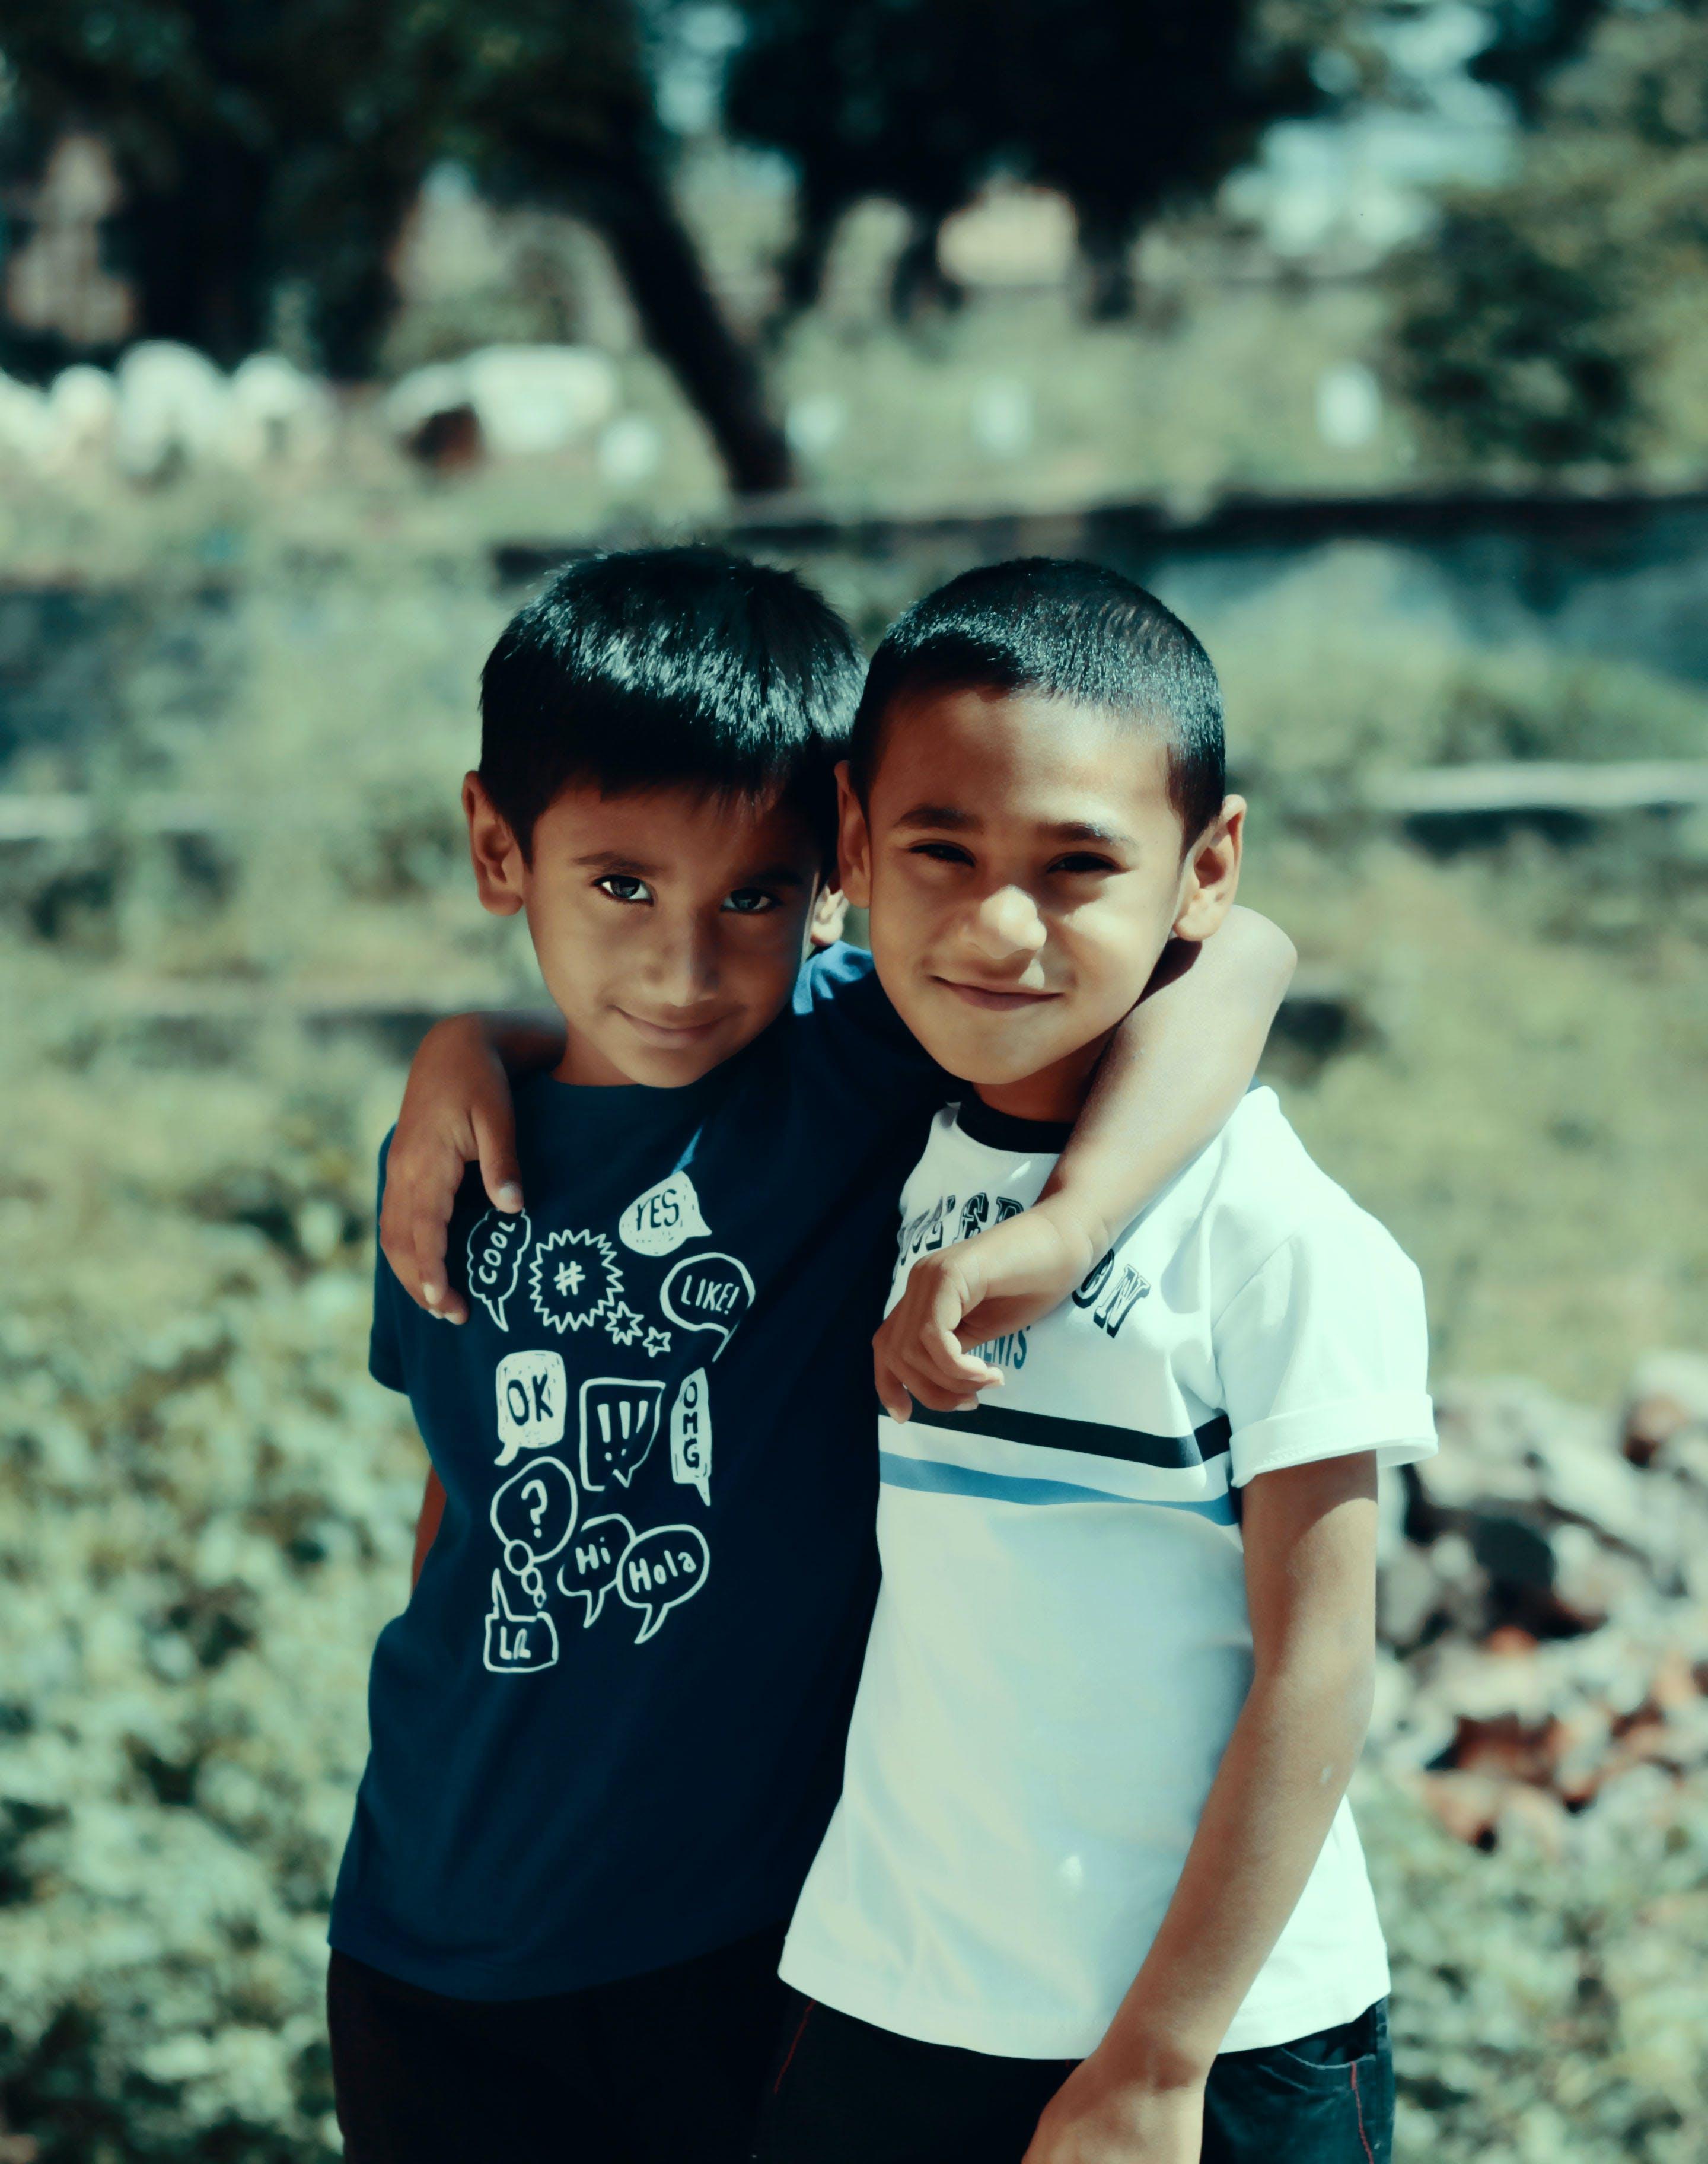 Free stock photo of #outdoorchallenge, Adobe Photoshop, asian children, boys